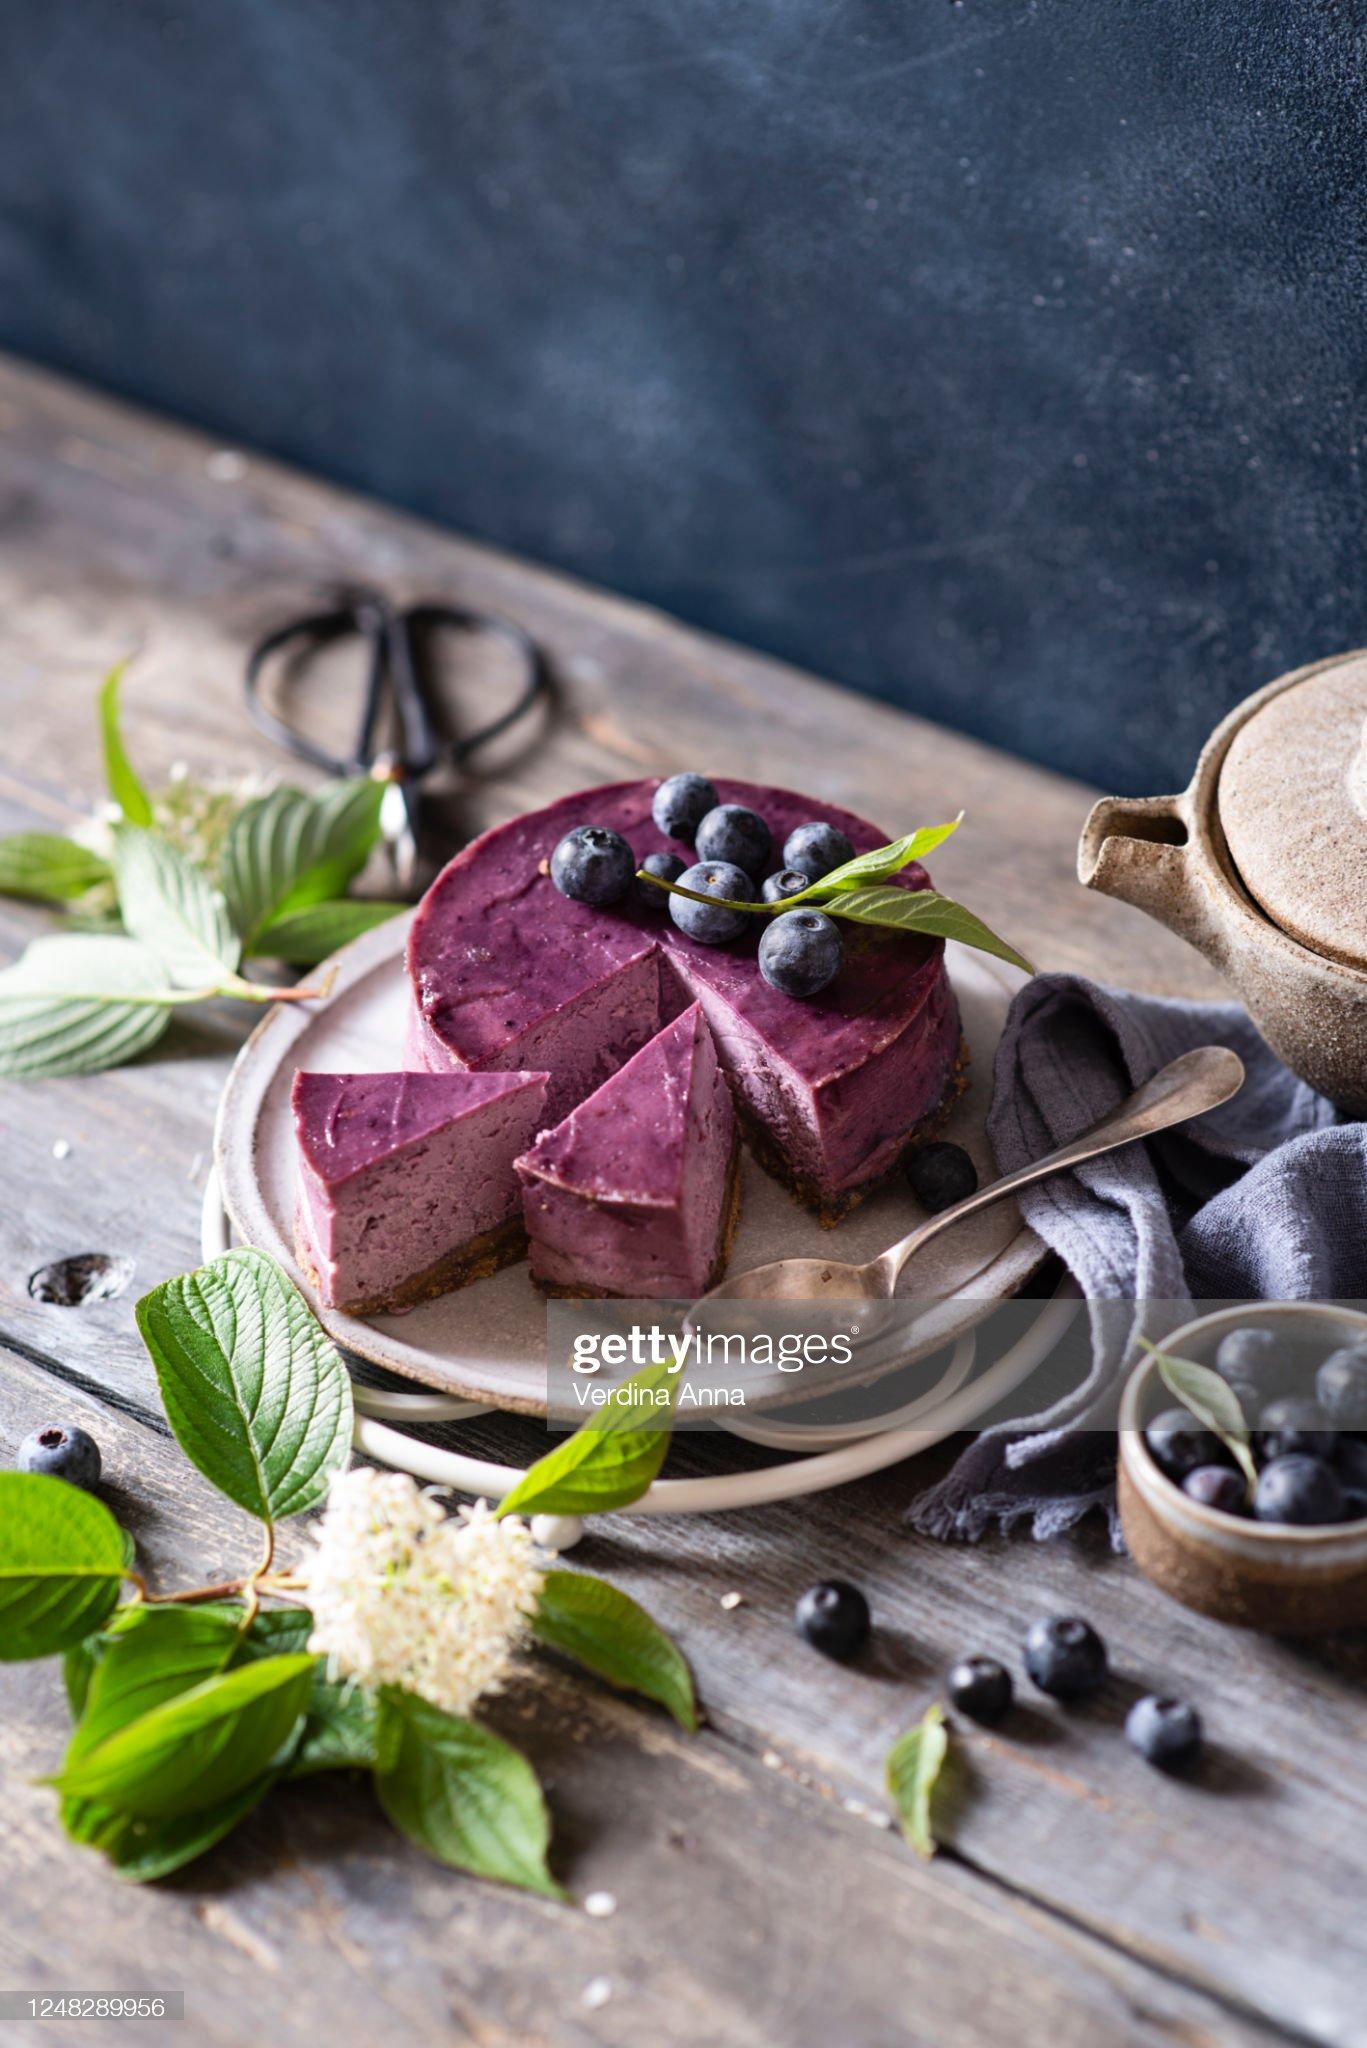 Blueberry cheesecake : 圖庫照片